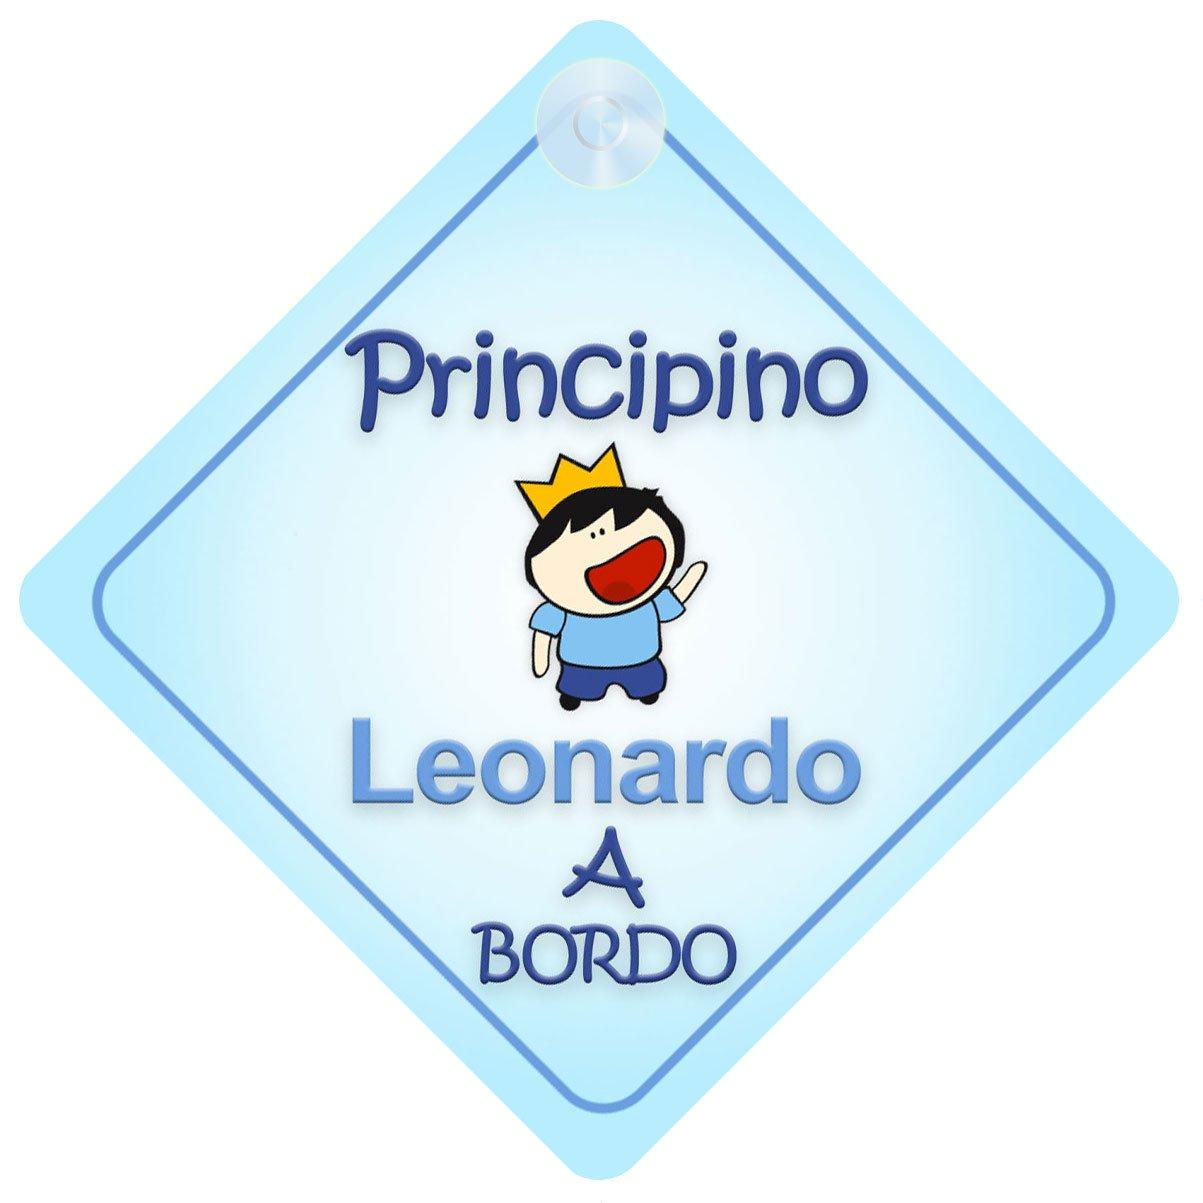 principino adesivo macchina neonato a bordo per maschi principe Principino Leonardo bambino adesivo bimbo